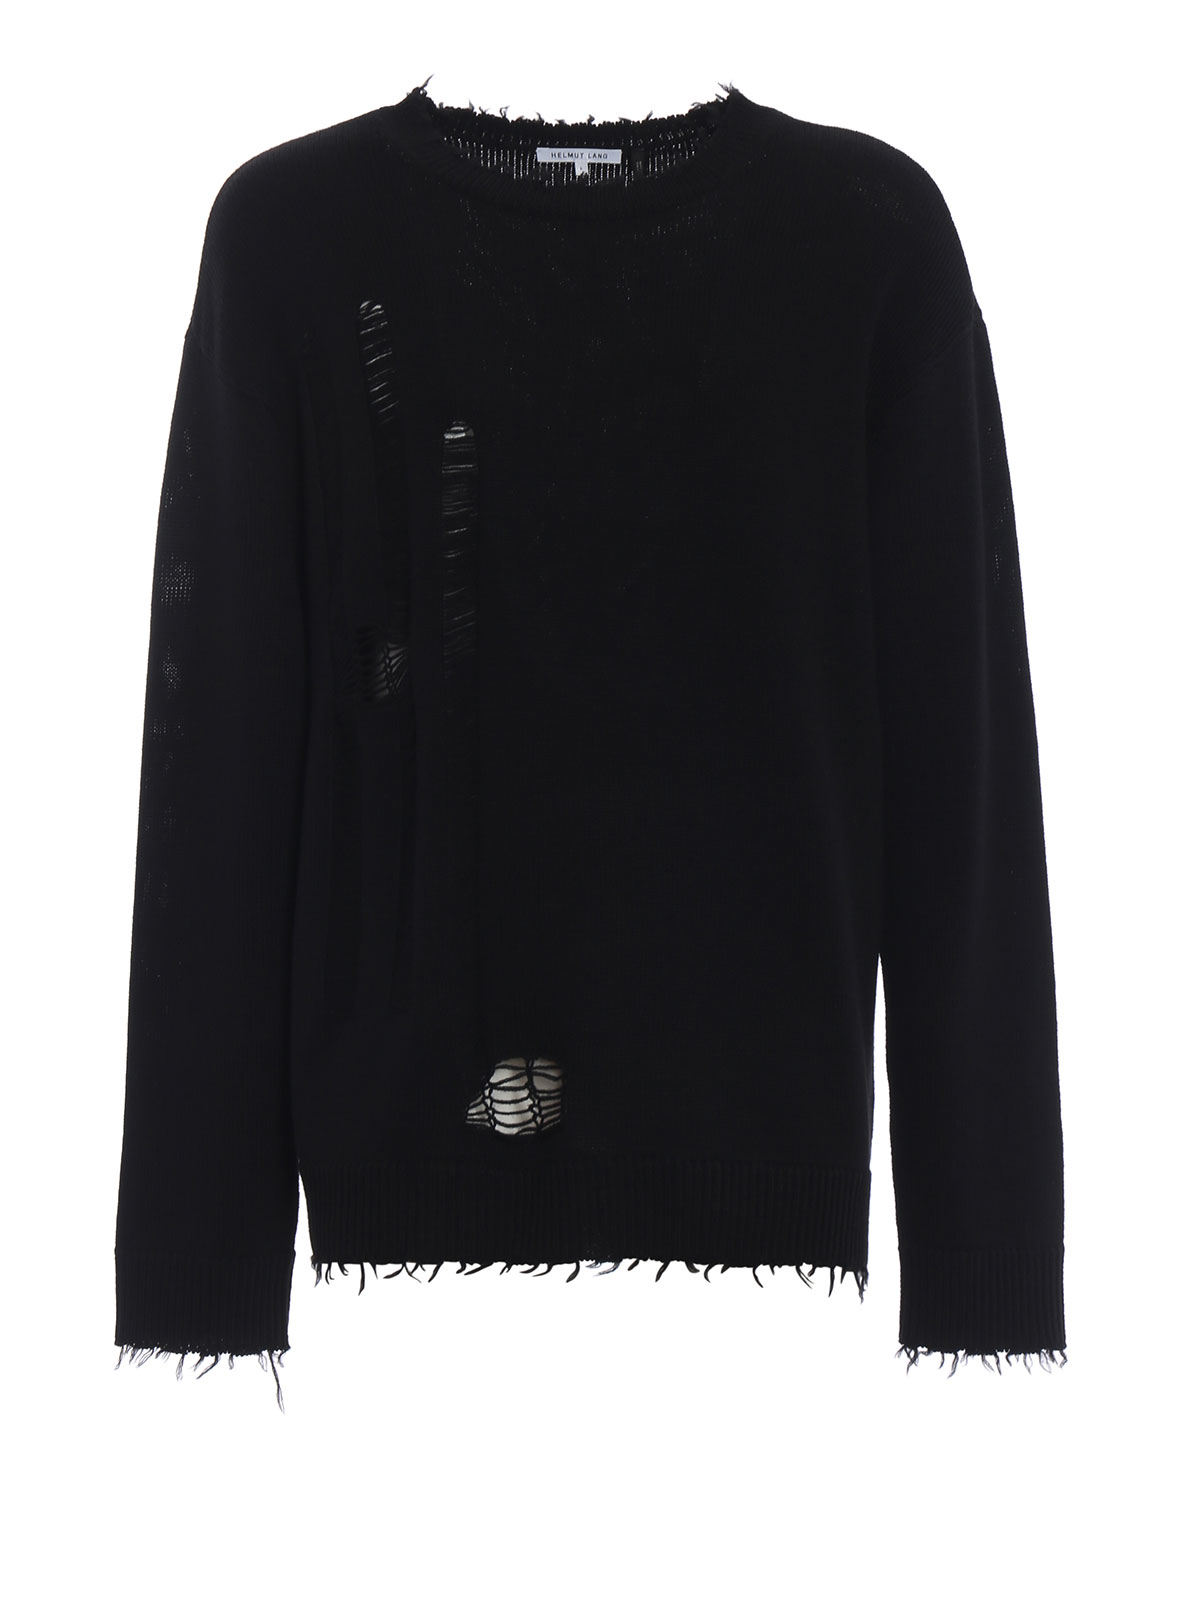 c13438f114808 Helmut Lang - Distressed black wool sweater - crew necks - I05HM702001